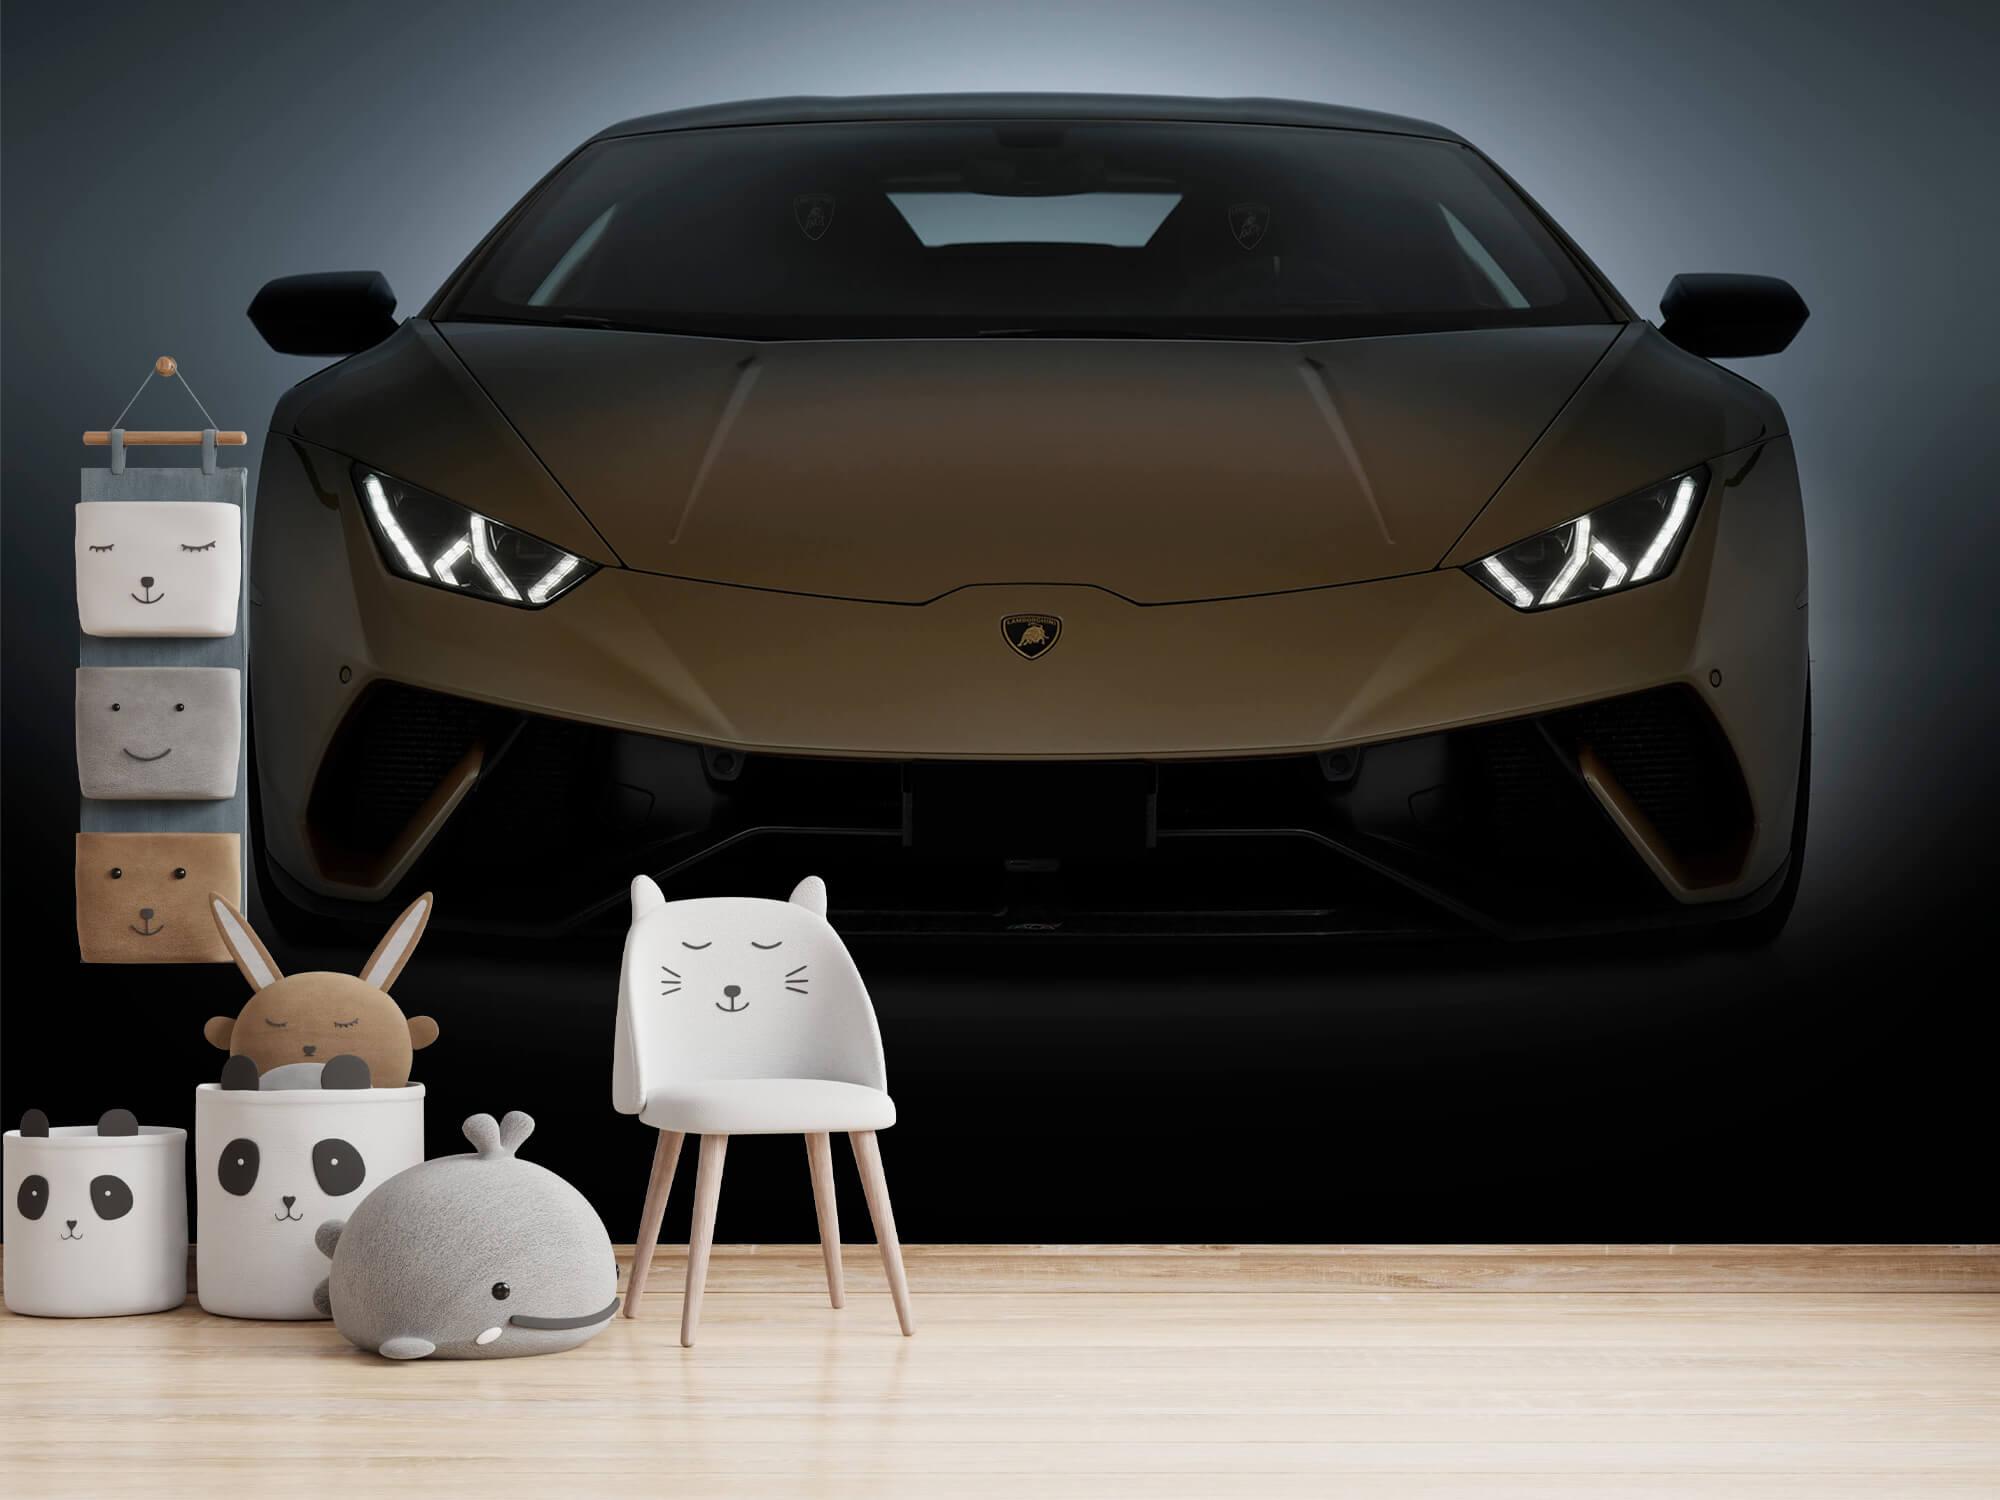 Wallpaper Lamborghini Huracán - Huracán - Fram 13